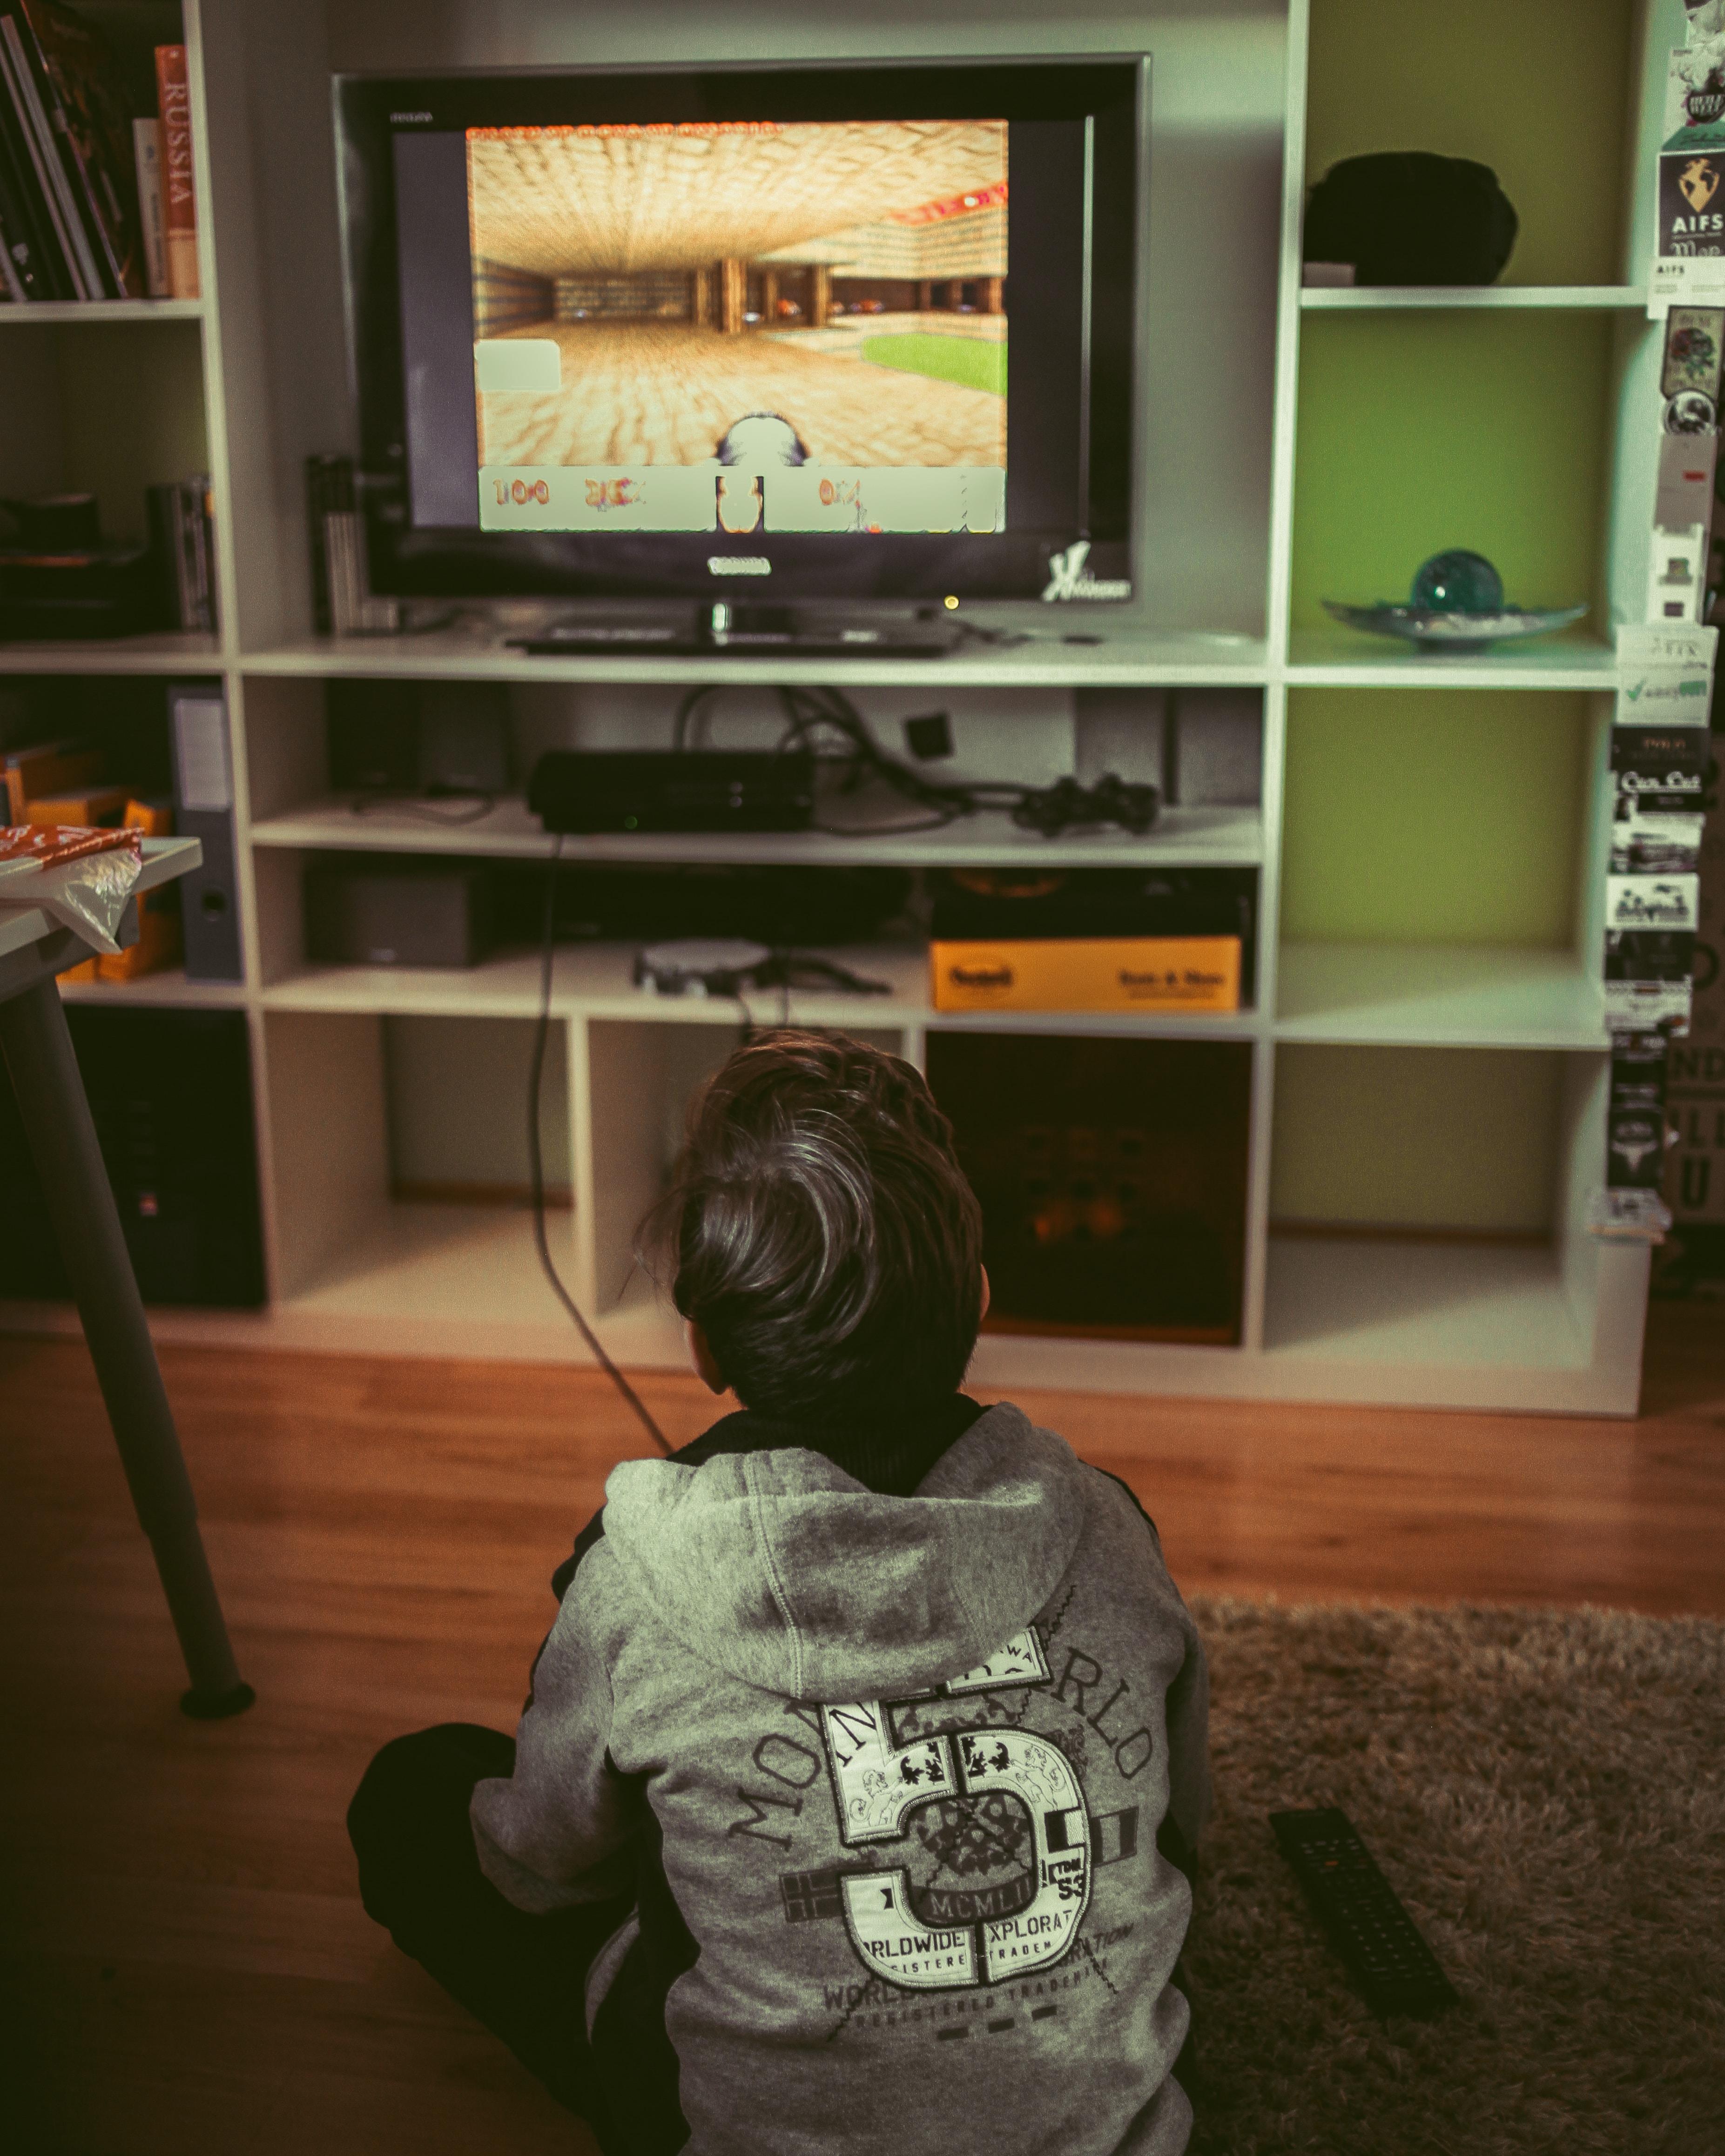 Realidad Virtual Y Entretenimiento 11 | Virtual Reality And Entertainment 11